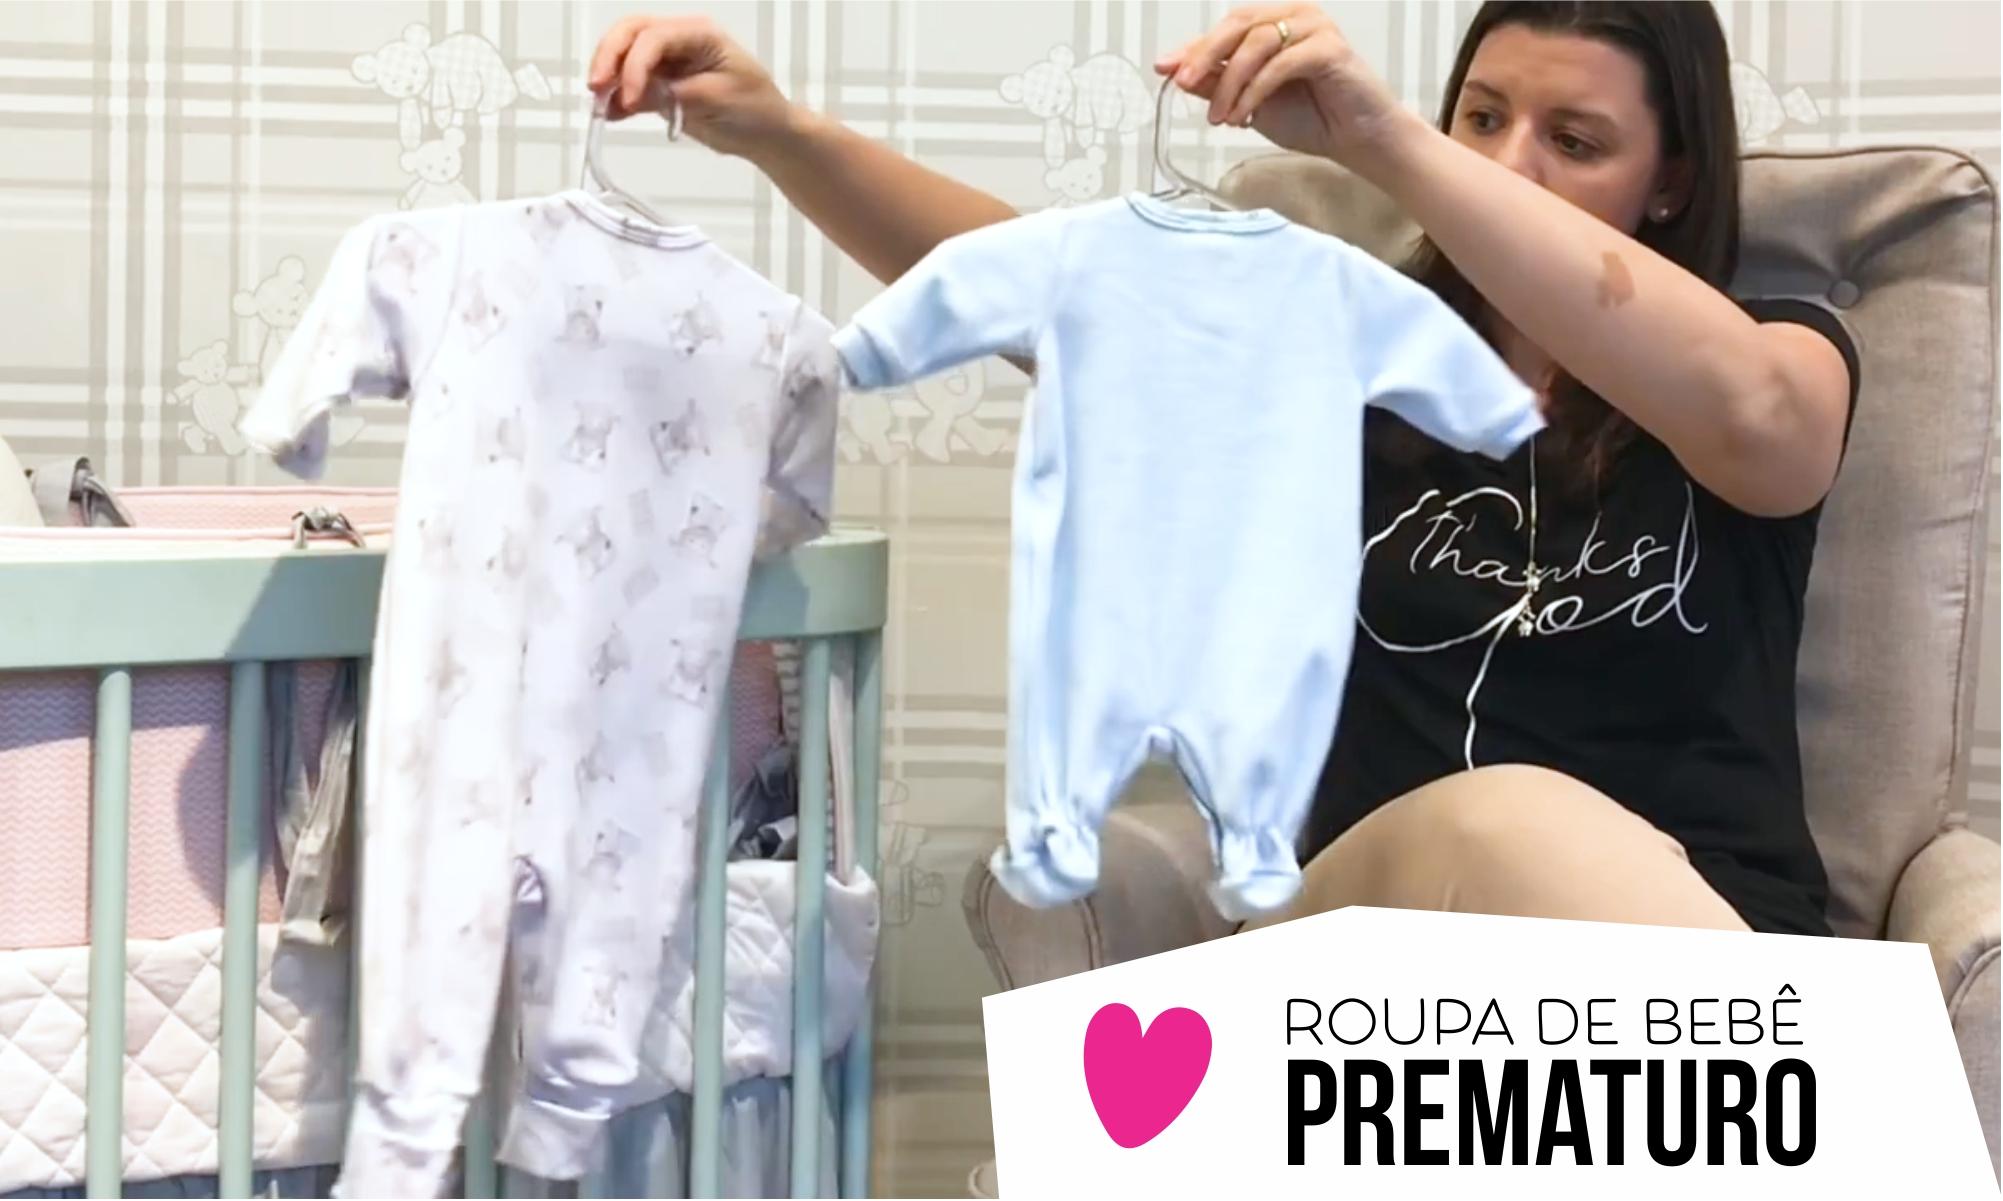 Onde comprar roupa de prematuro em Curitiba?